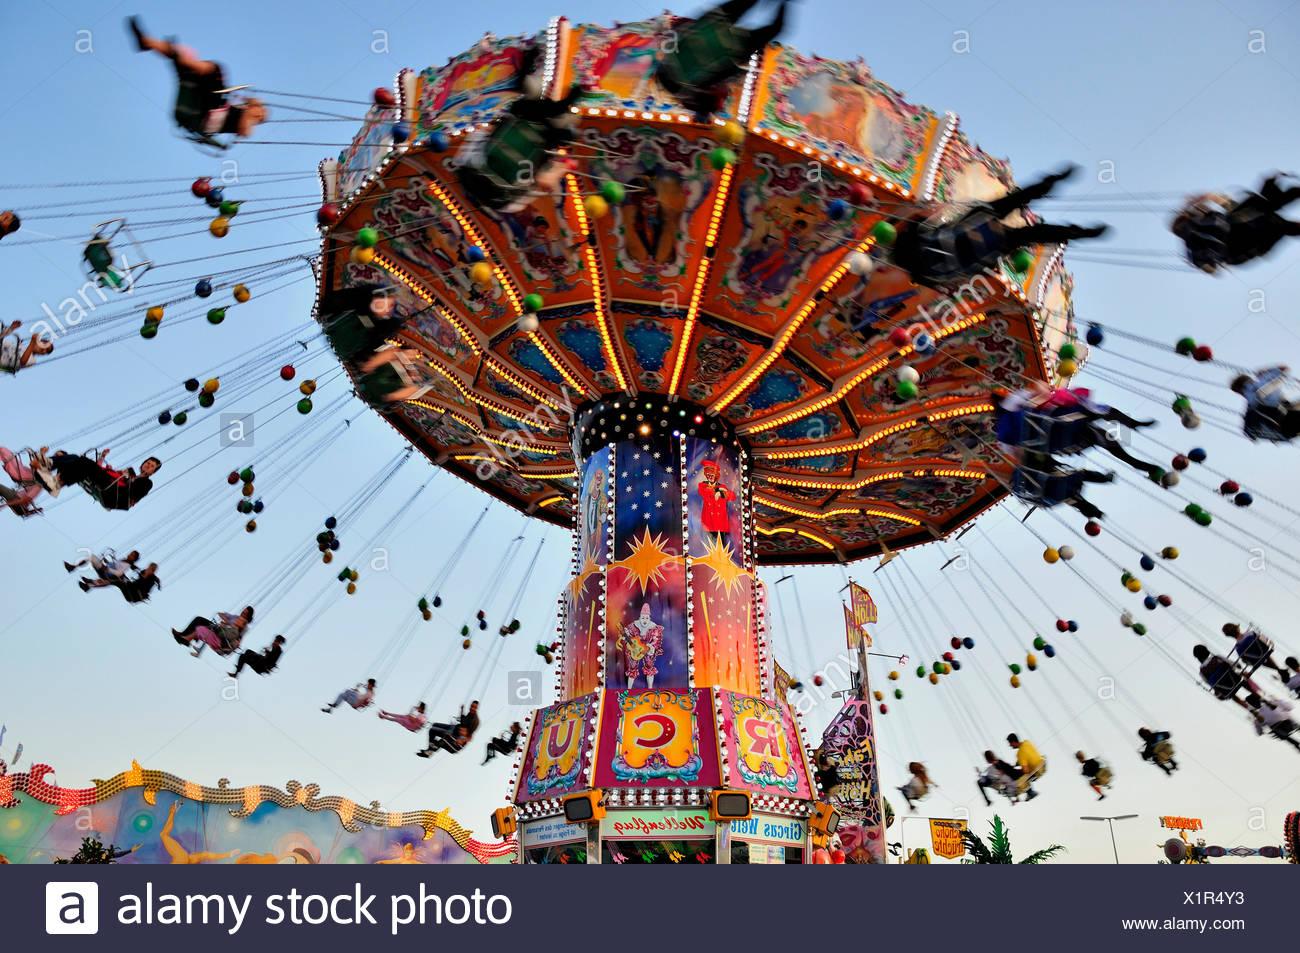 "Chairoplane or chain carousel ""Wellenflug"", Oktoberfest, Munich, Bavaria Stock Photo"